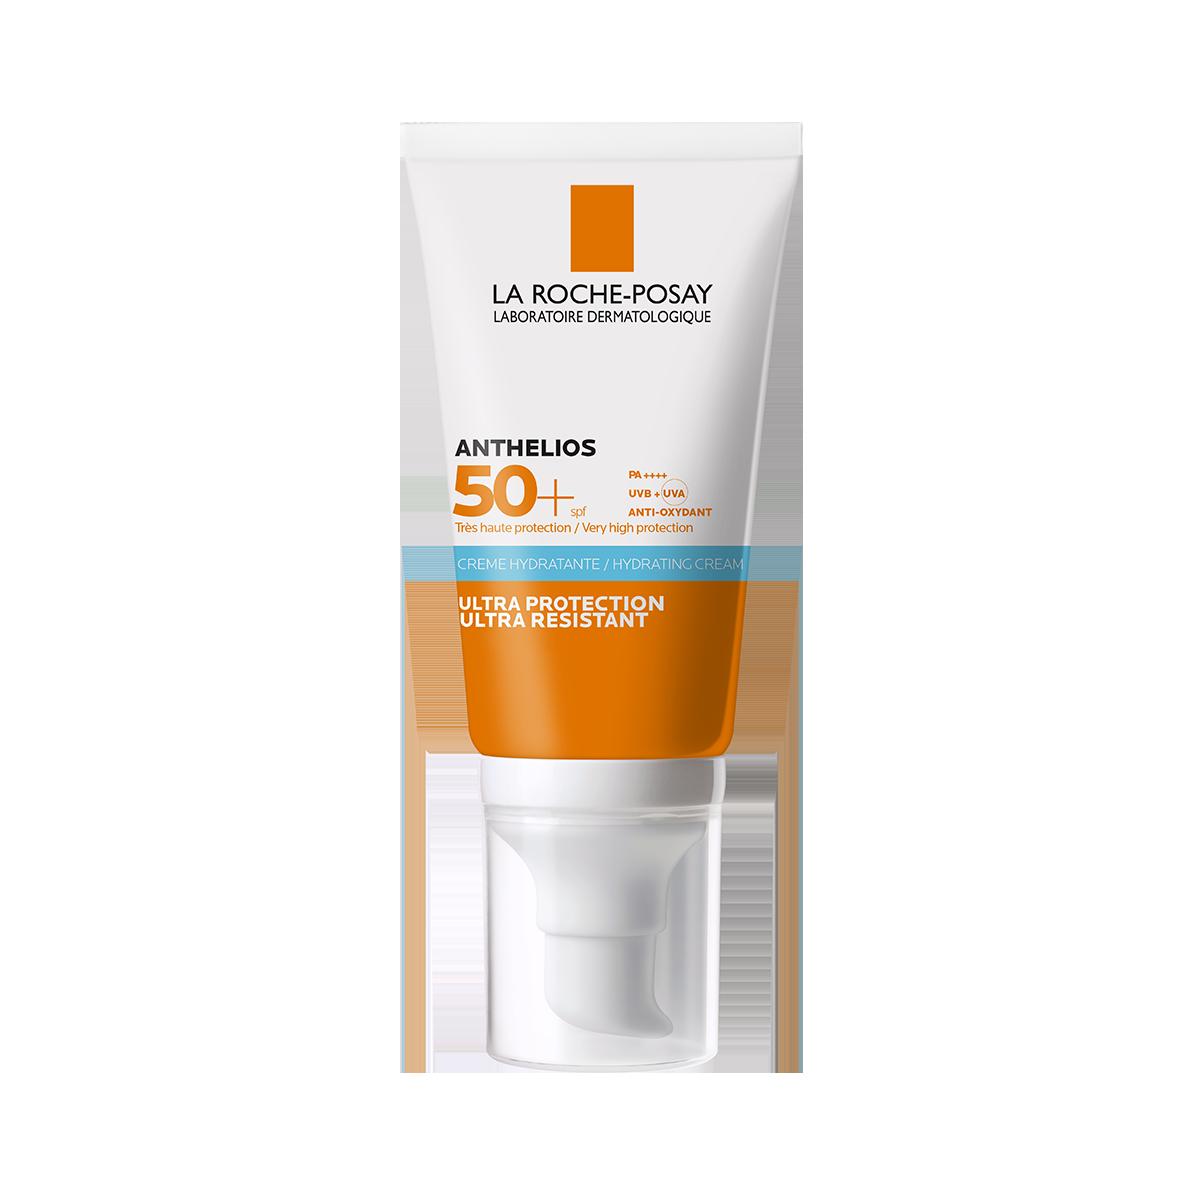 LRP Anthelios Cream AP SPF50 50ml Tube